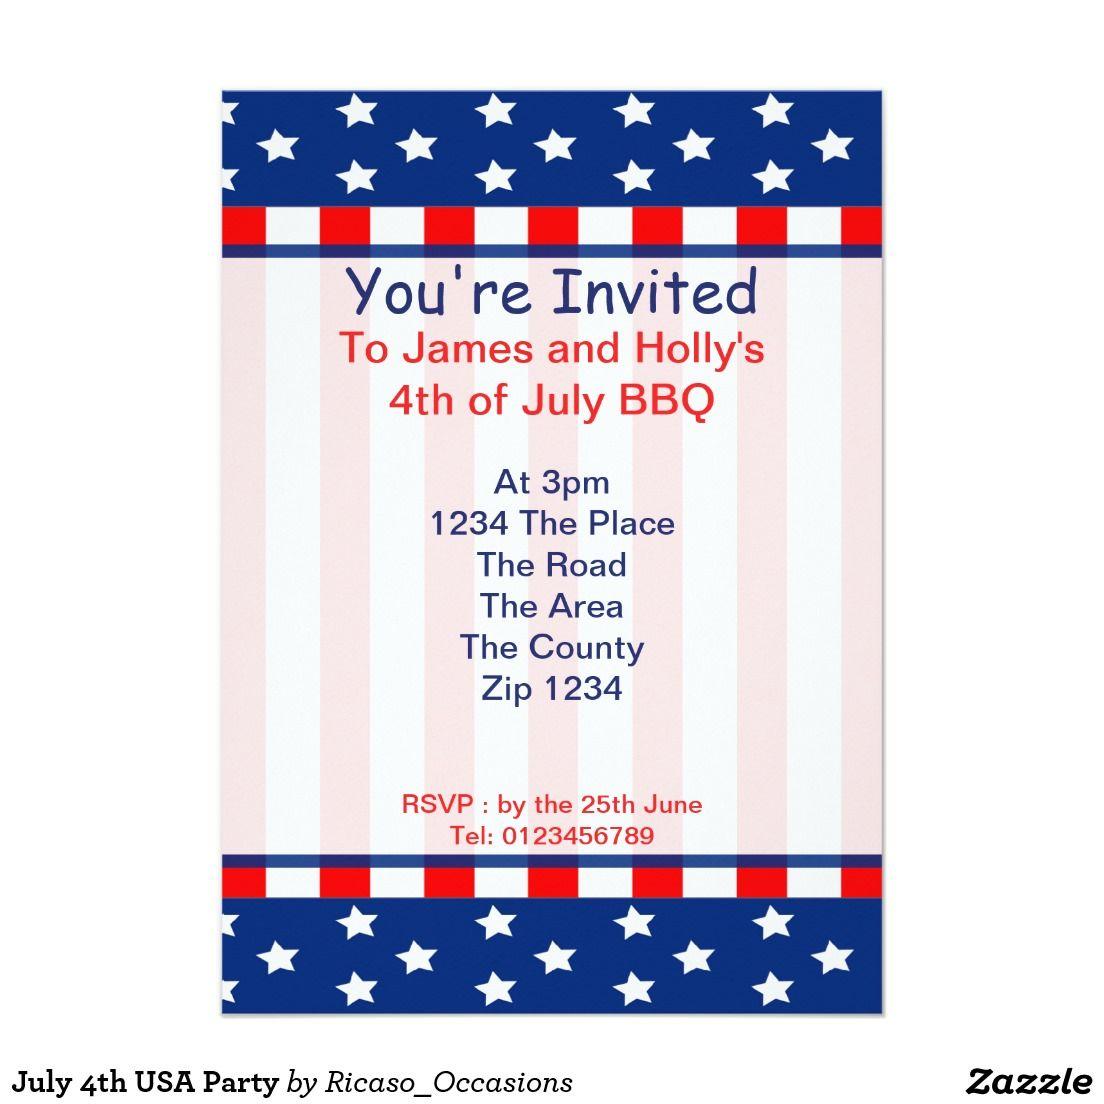 July 4th Usa Party 5 X 7 Invitation Card Usa Party Invitations Invitation Cards